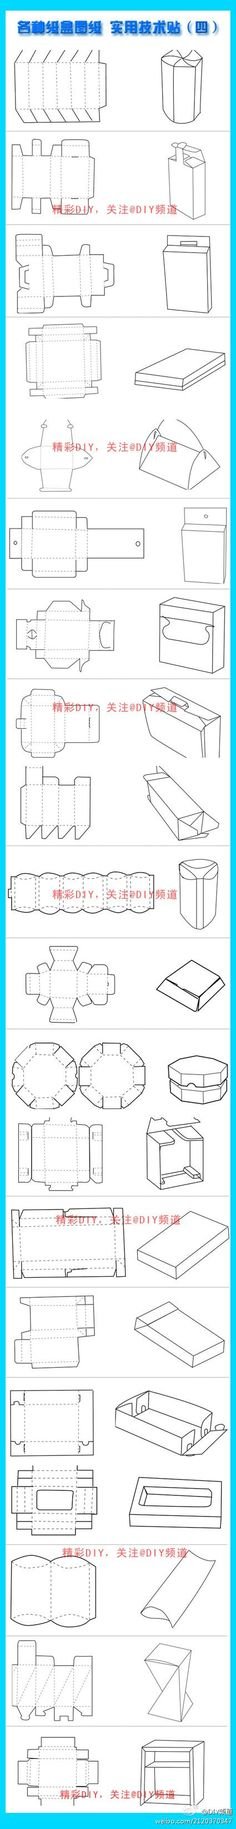 more paper cartons